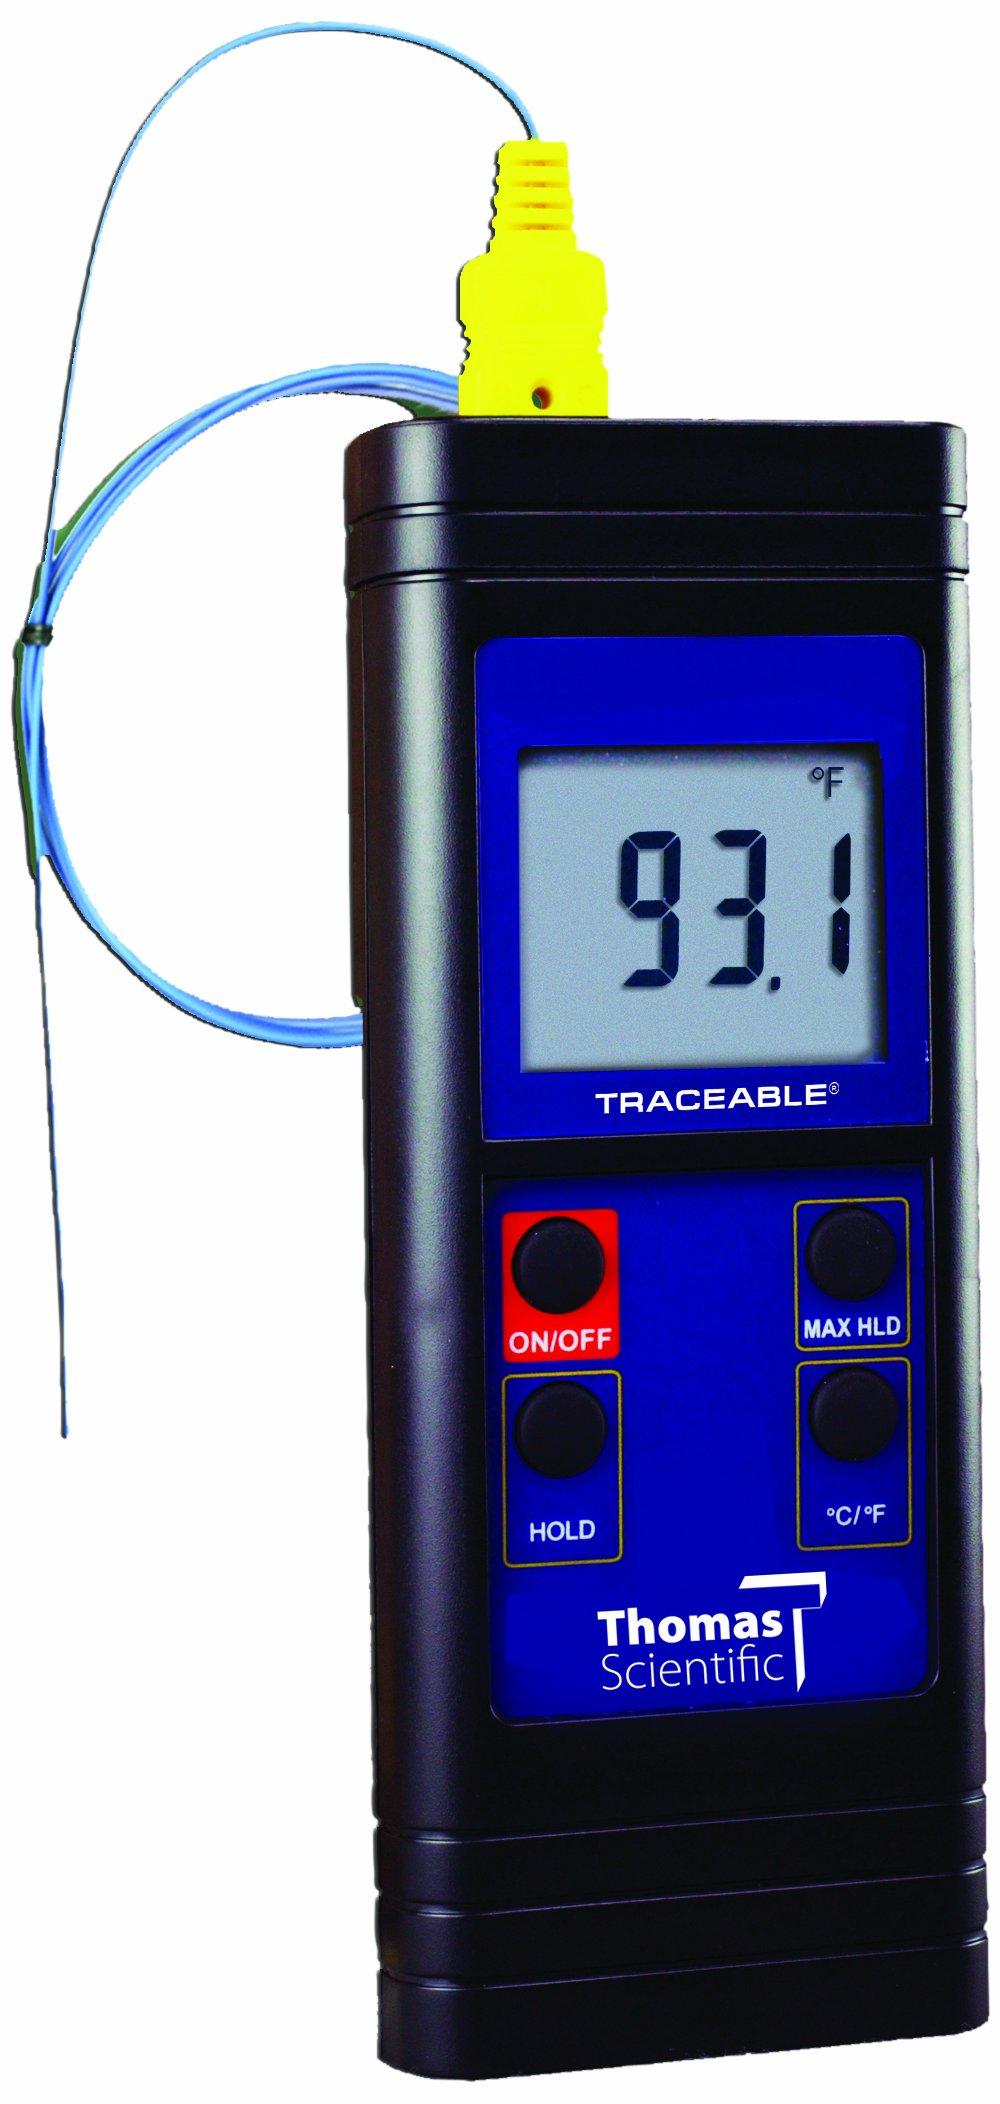 Thomas Waterproof Type K Digital Thermometer, -328 to 2372 degree F, -200 to 1300 degree C